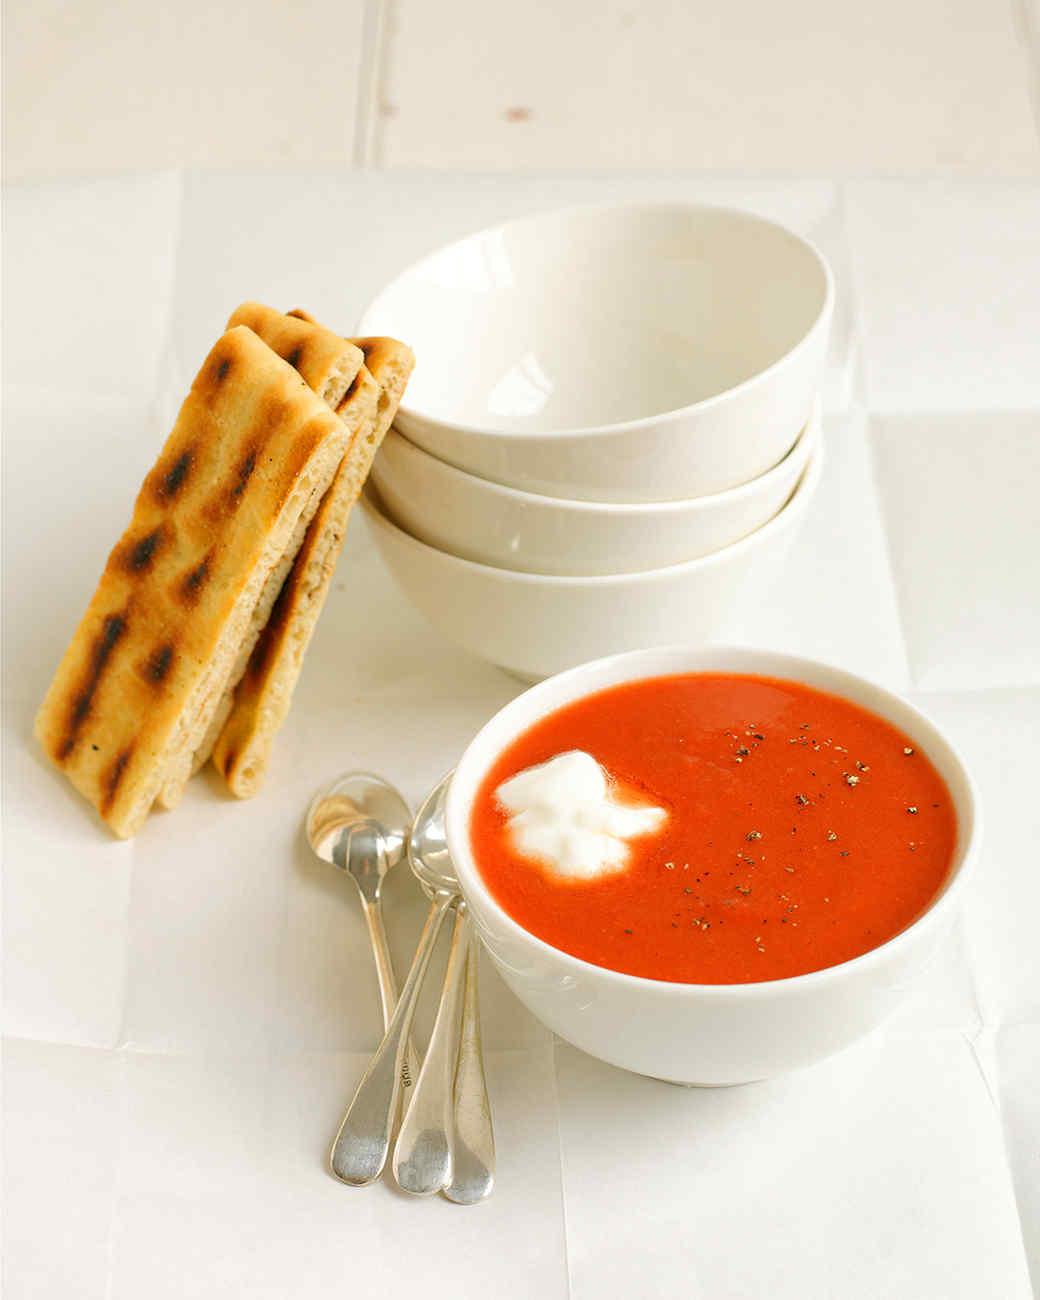 edf_jul06_insea_tomato_soup.jpg